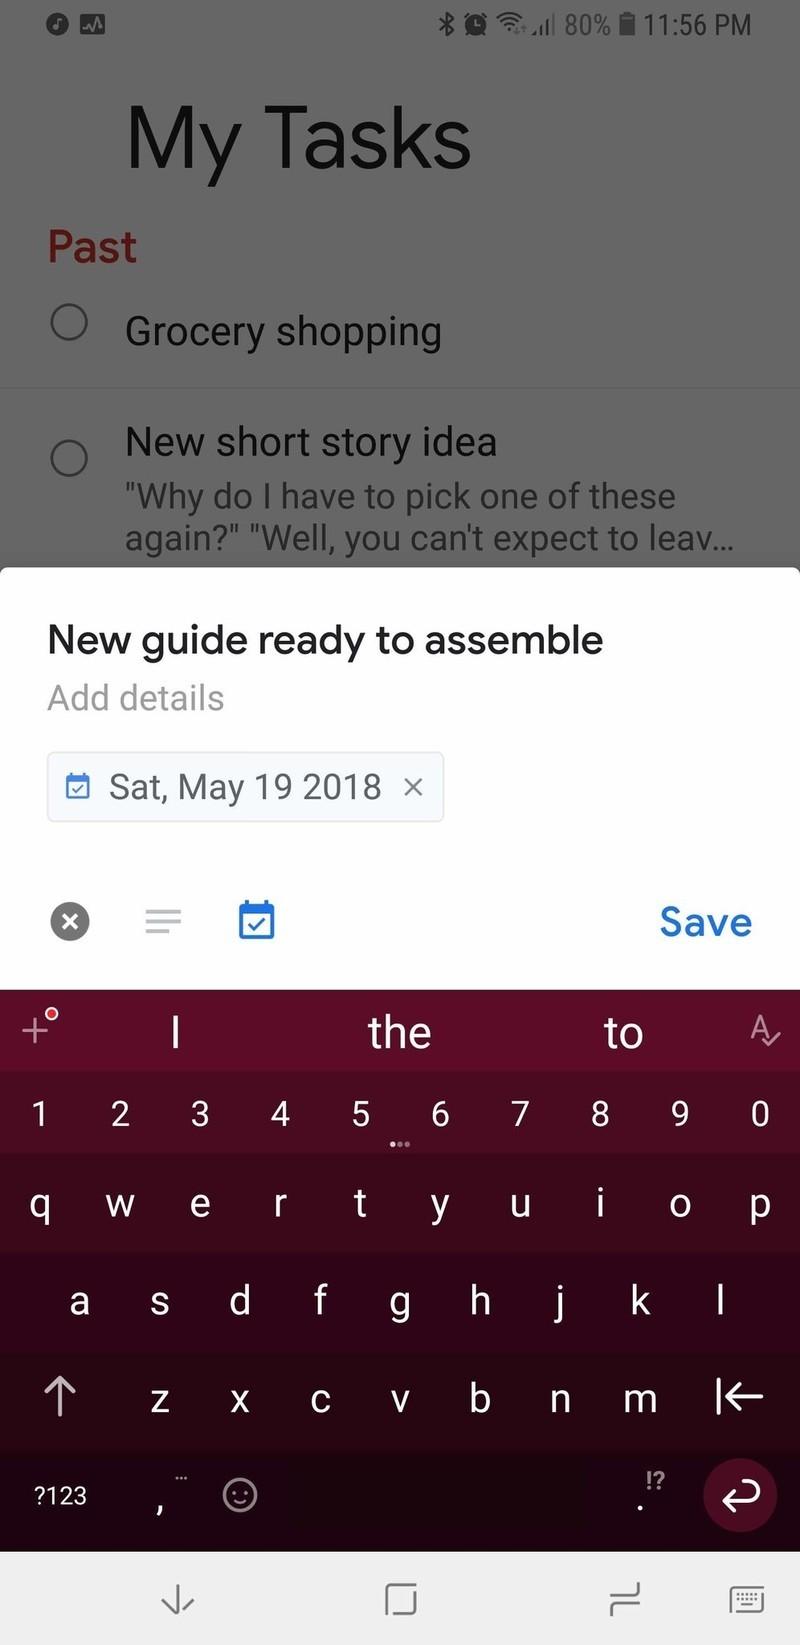 google-tasks-task-creation.jpg?itok=fGyN